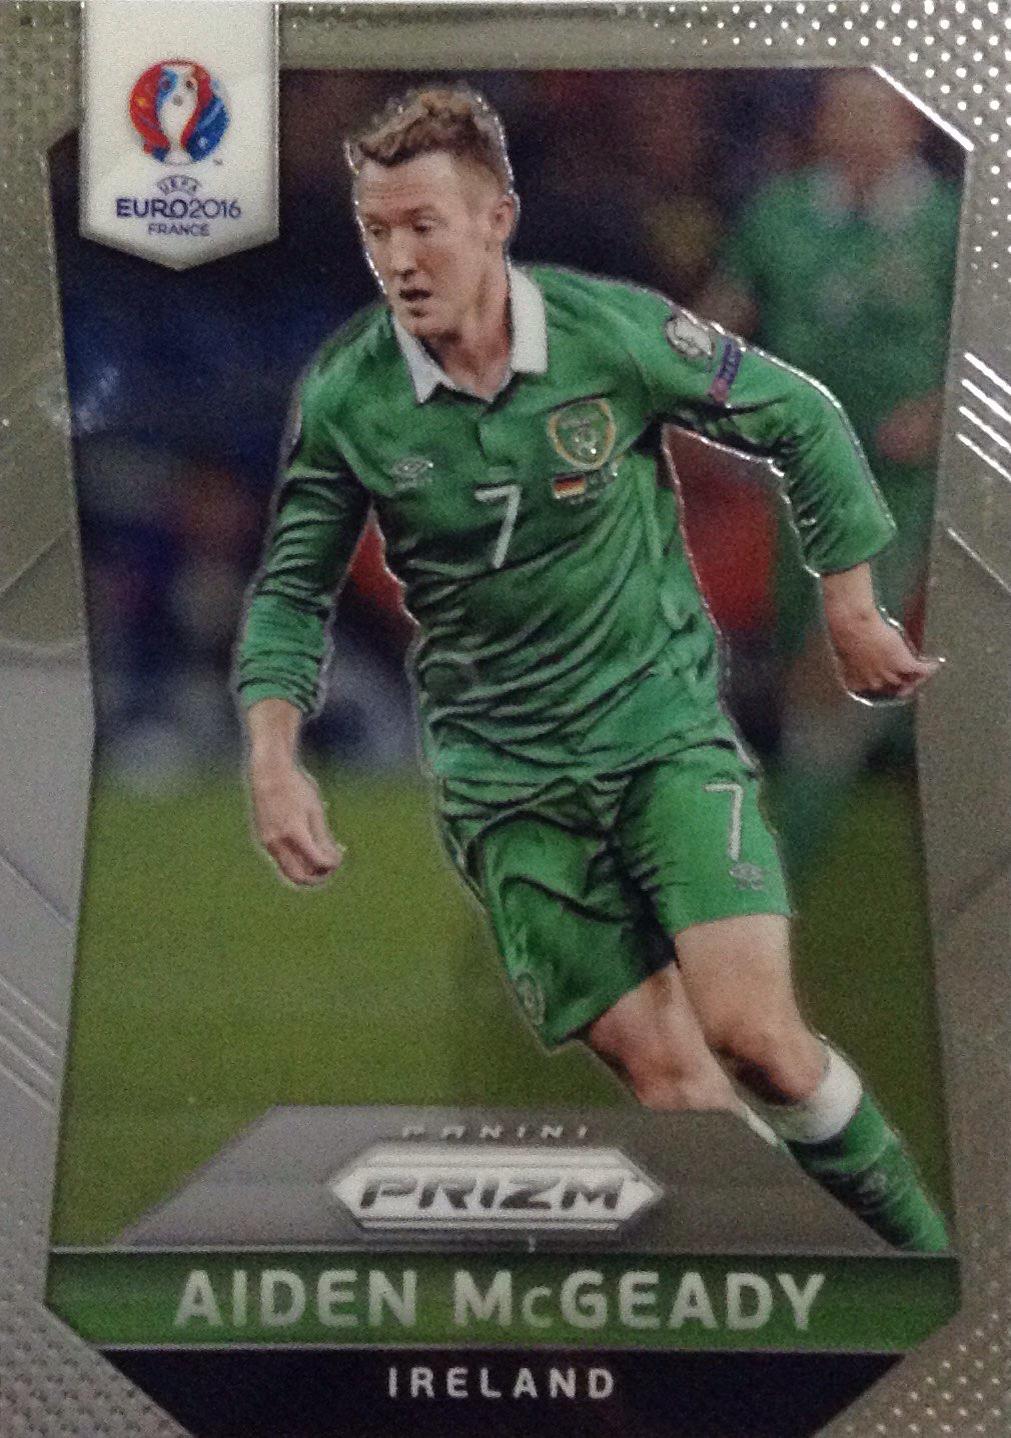 【Ed】2016Panini帕尼尼欧洲杯足球球星卡Aiden McGeady麦克吉迪爱尔兰NO.223普卡